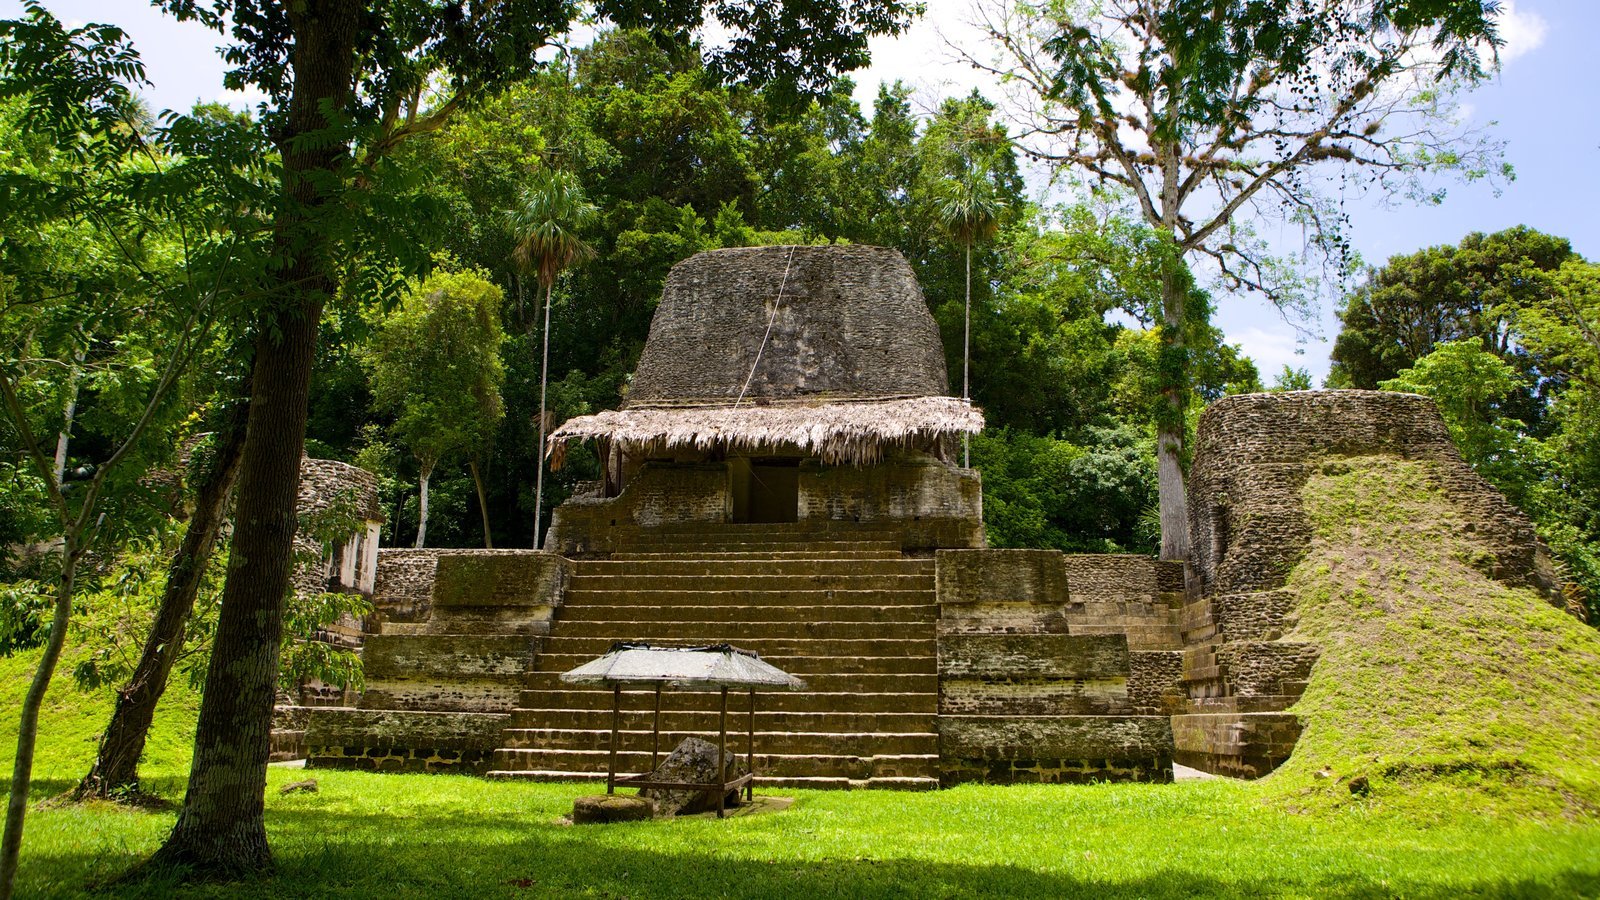 Tikal caracterizando ruínas de edifício e elementos de patrimônio